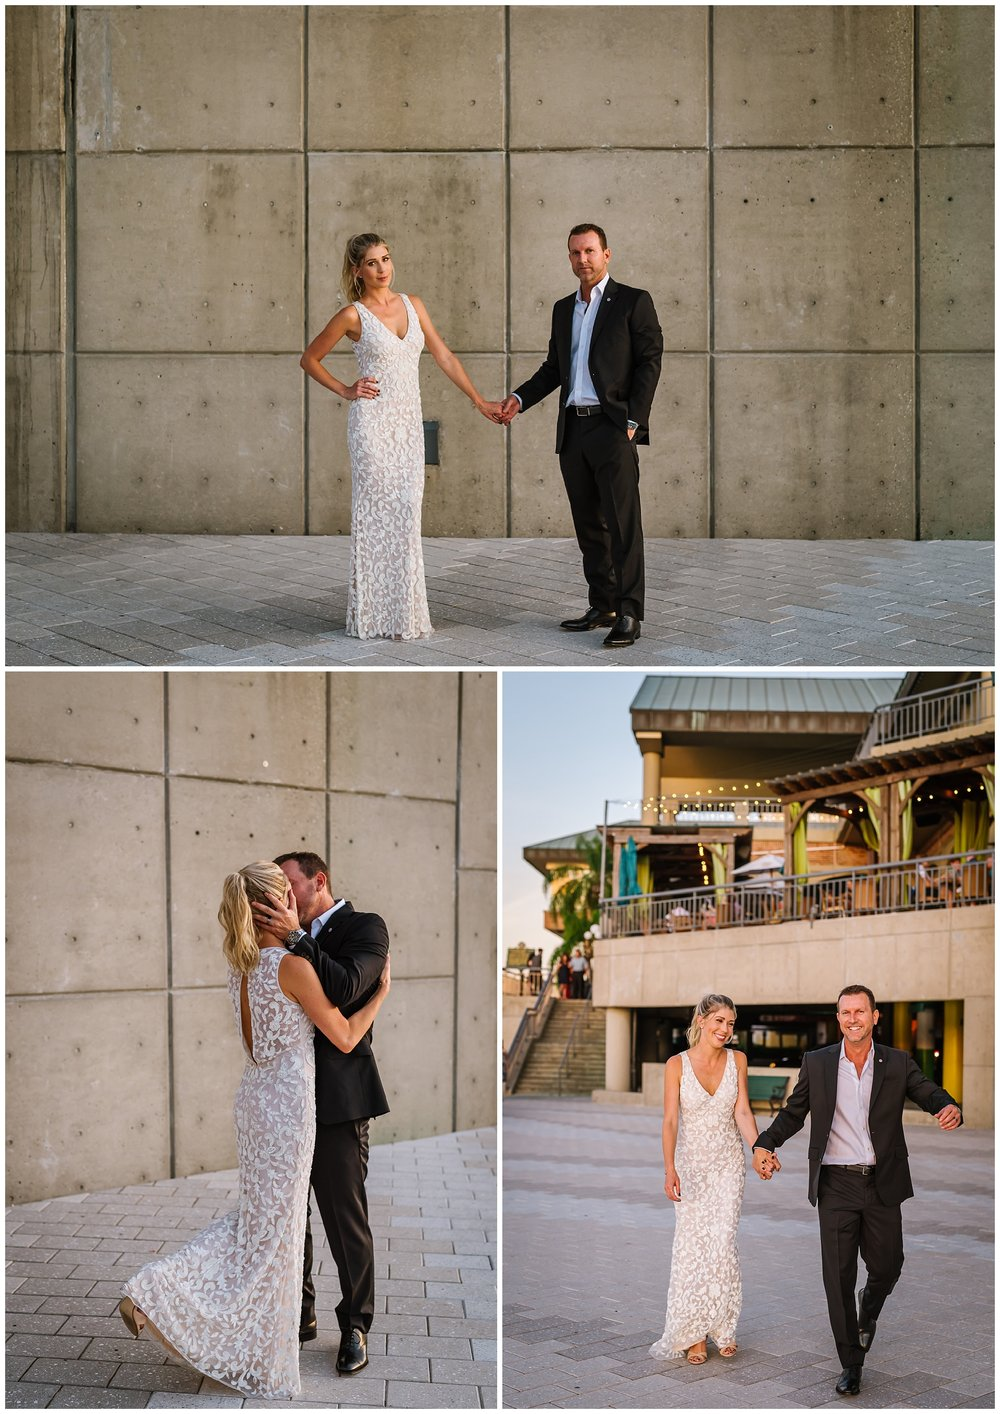 Tampa-wedding-photographer-downtown-bhldn-intimate_0056.jpg